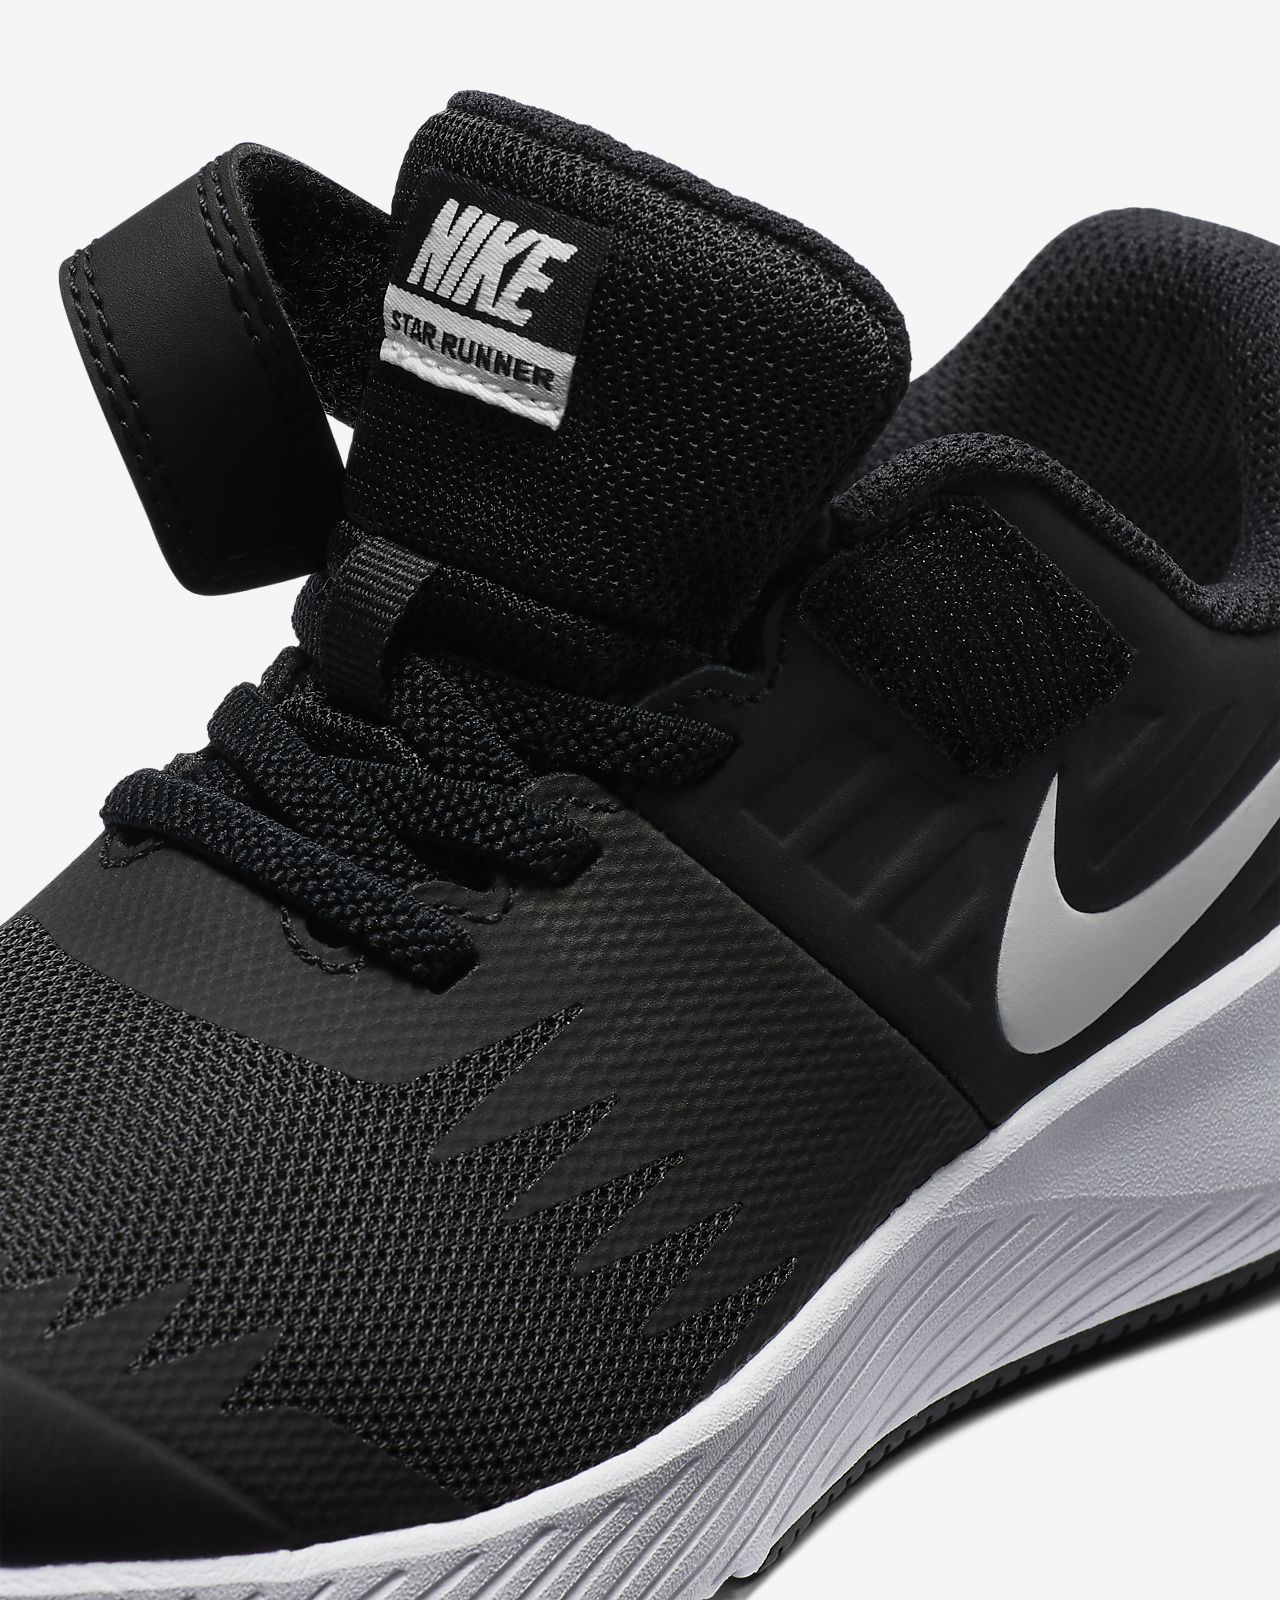 Discrepancia septiembre alimentar  Nike Star Runner Younger Kids' Shoe. Nike MA